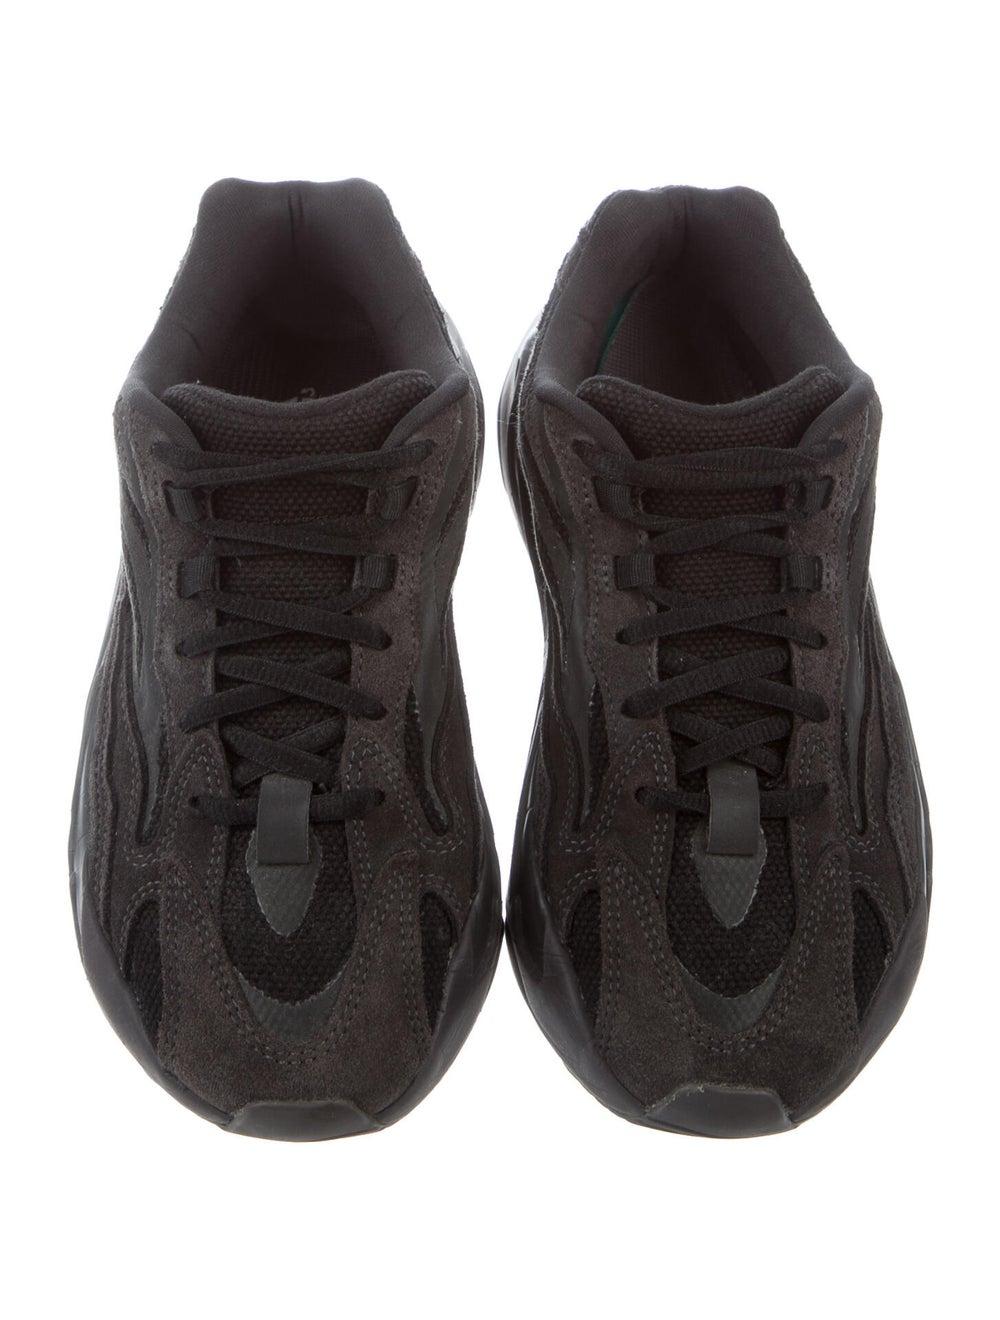 Yeezy x adidas 2019 Boost 700 V2 Vanta Sneakers S… - image 3